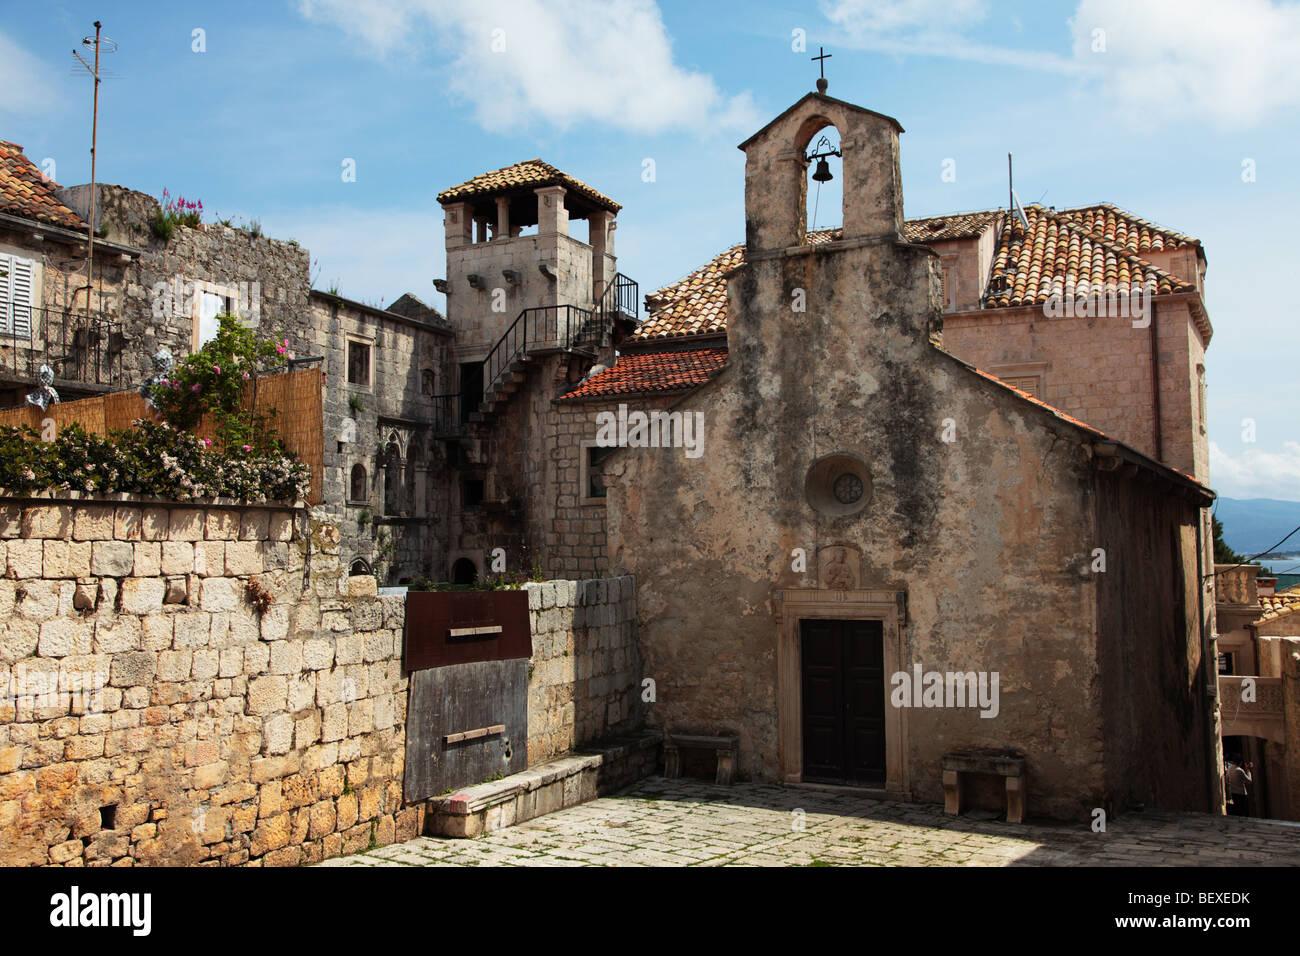 Church of All Saints on island of Korcula, Croatia - Stock Image